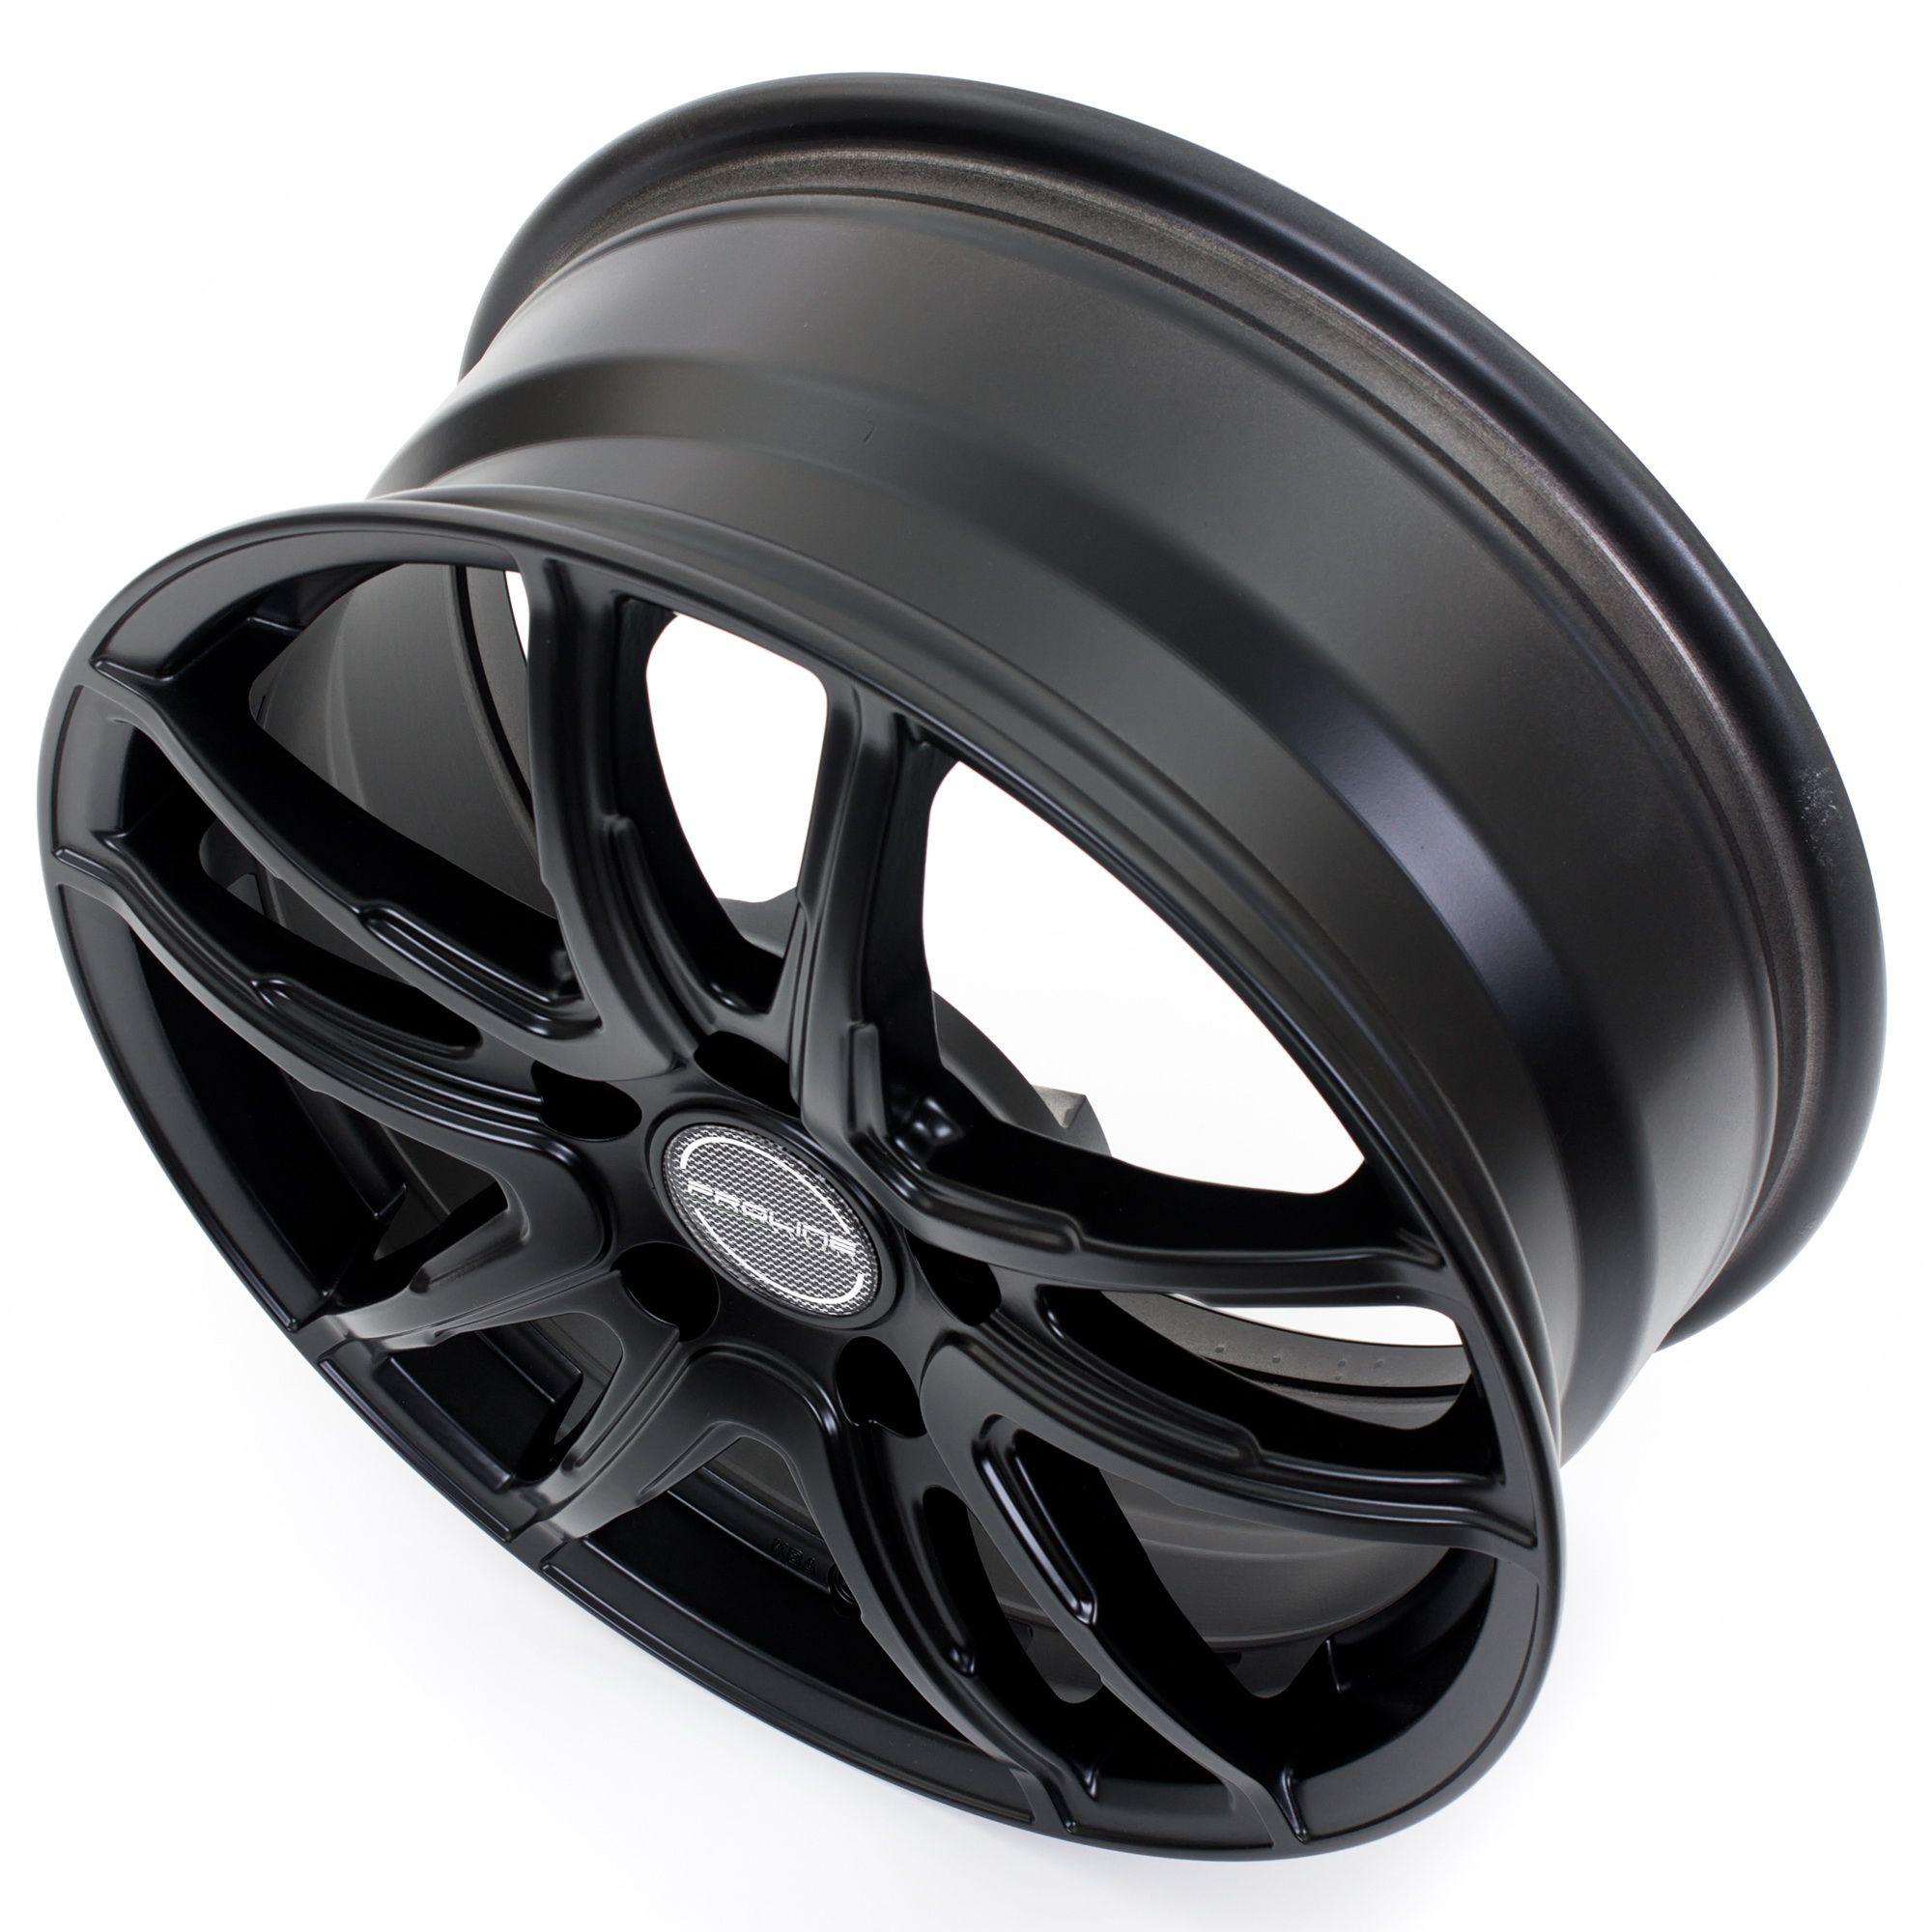 proline wheels vx100 felgen black matt in 14 zoll. Black Bedroom Furniture Sets. Home Design Ideas